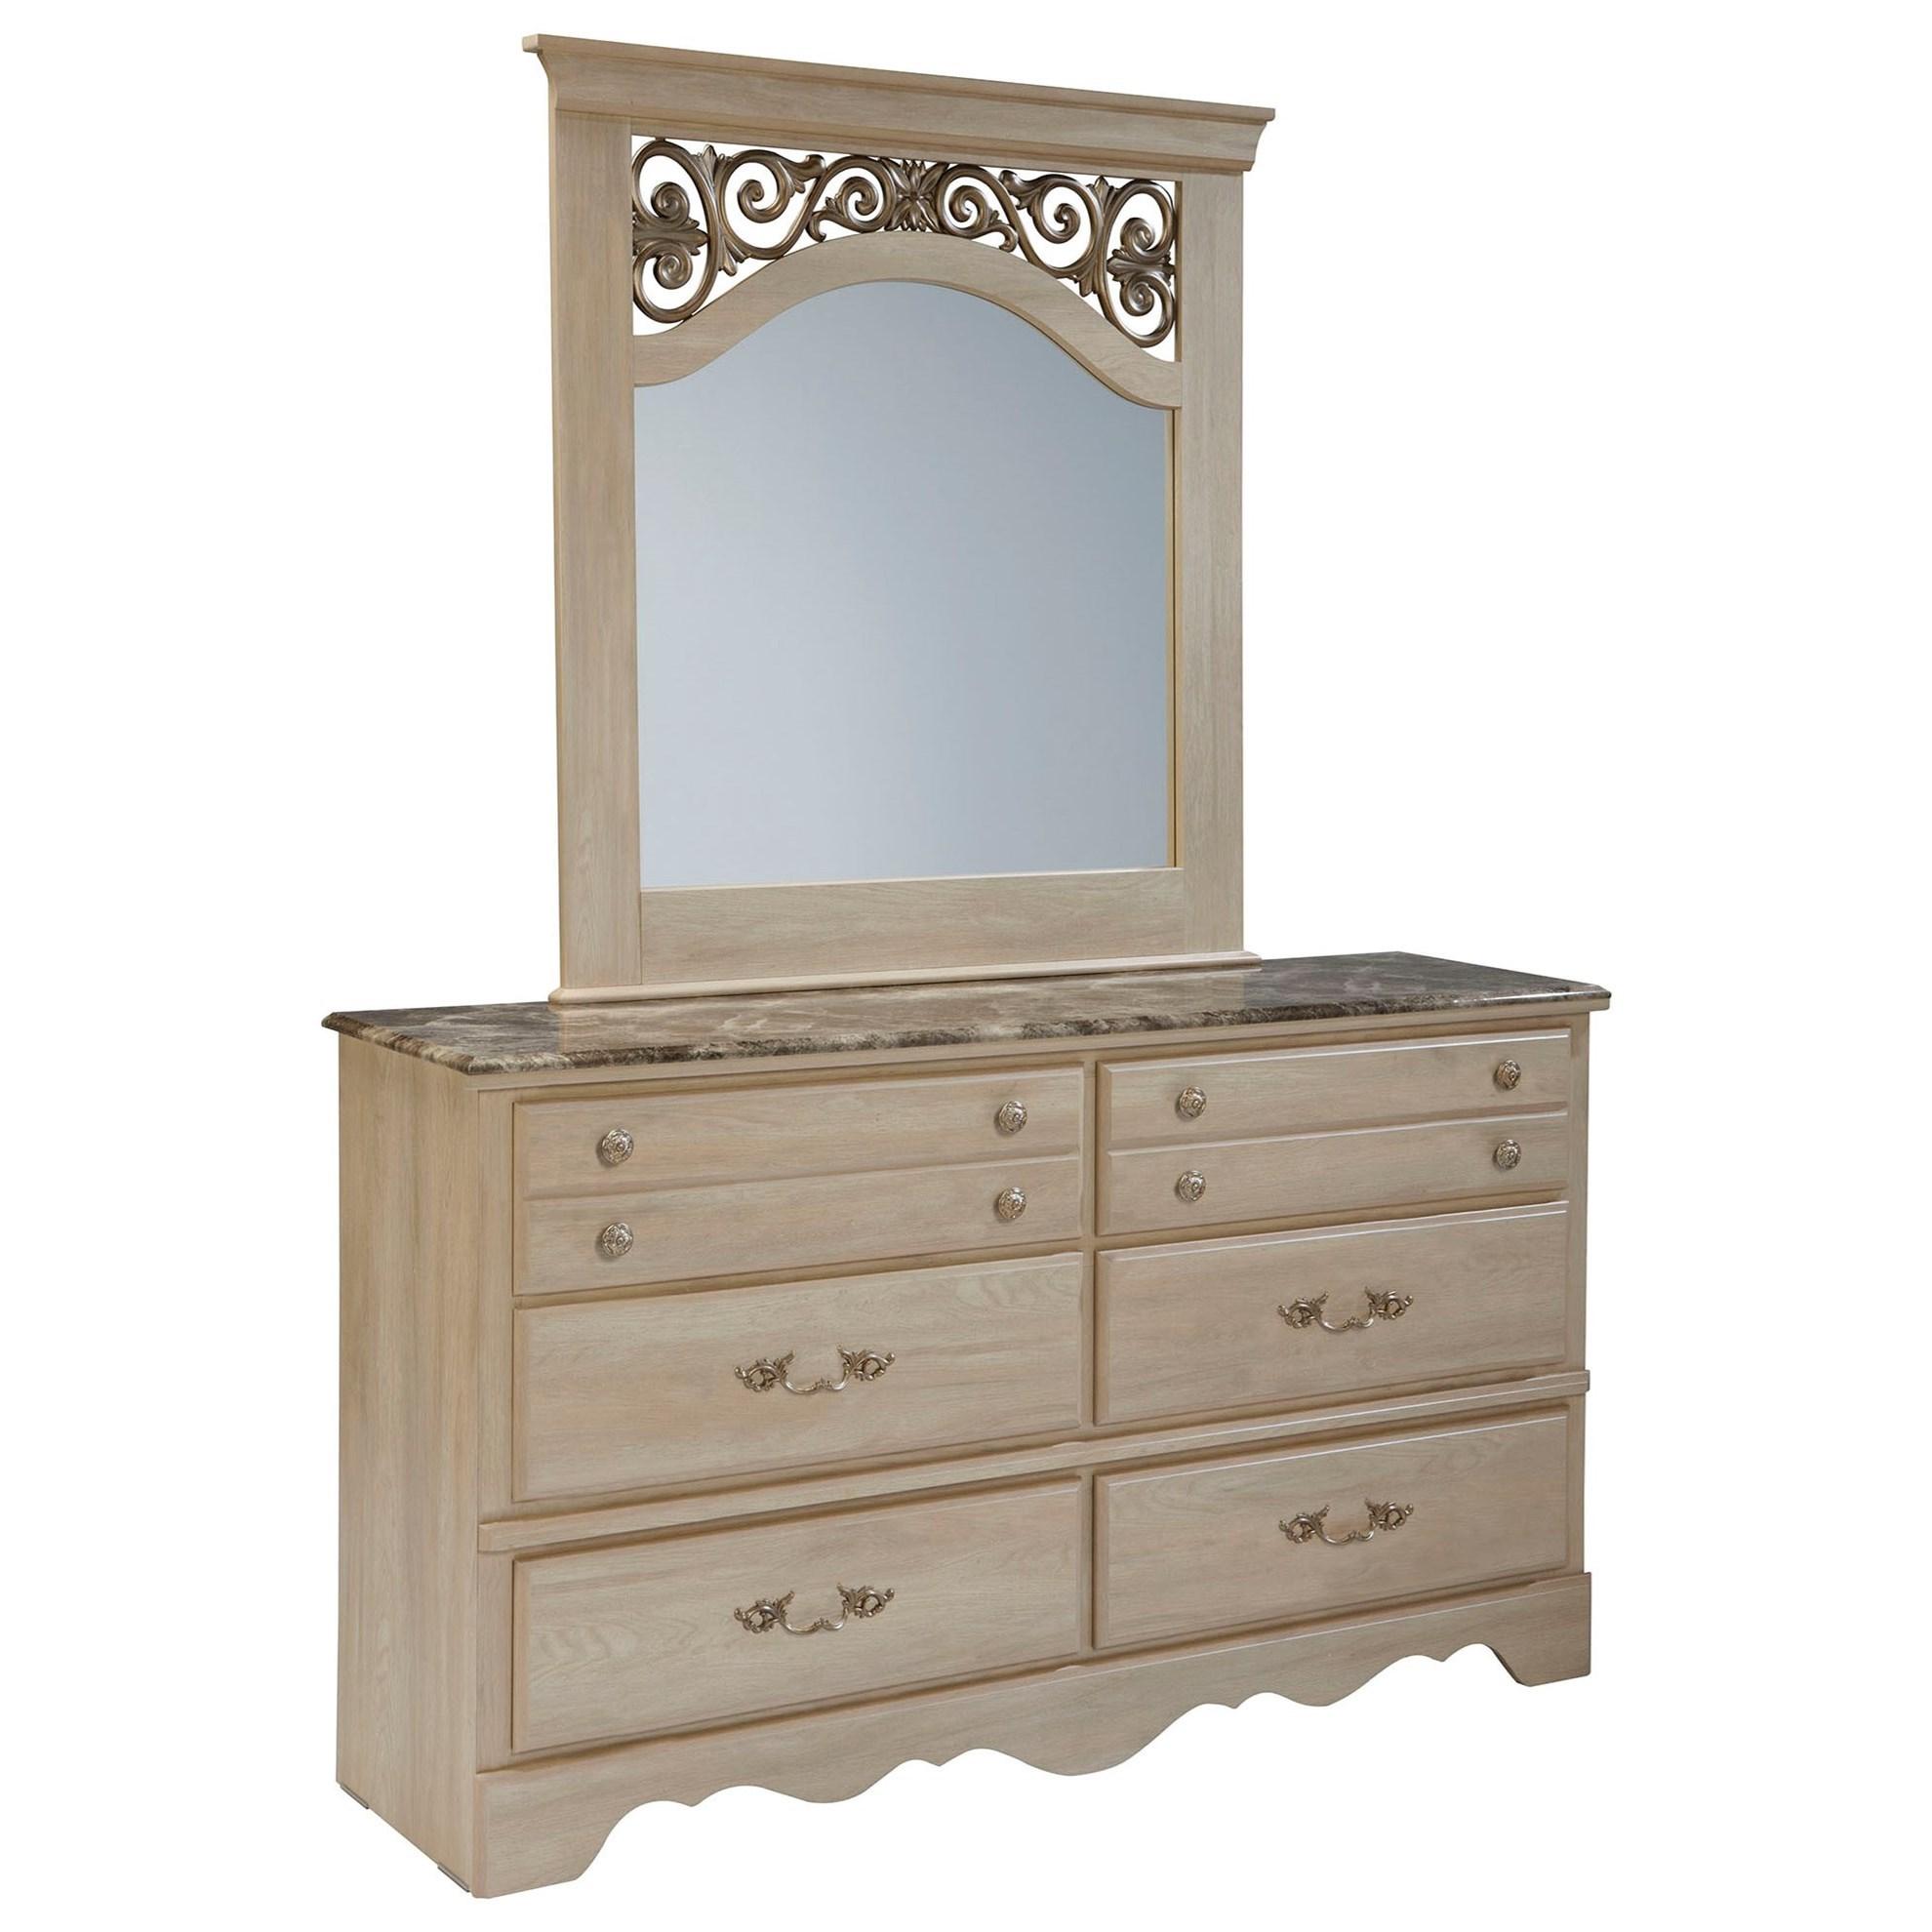 Montecito Dresser + Mirror Set by Standard Furniture at Adcock Furniture